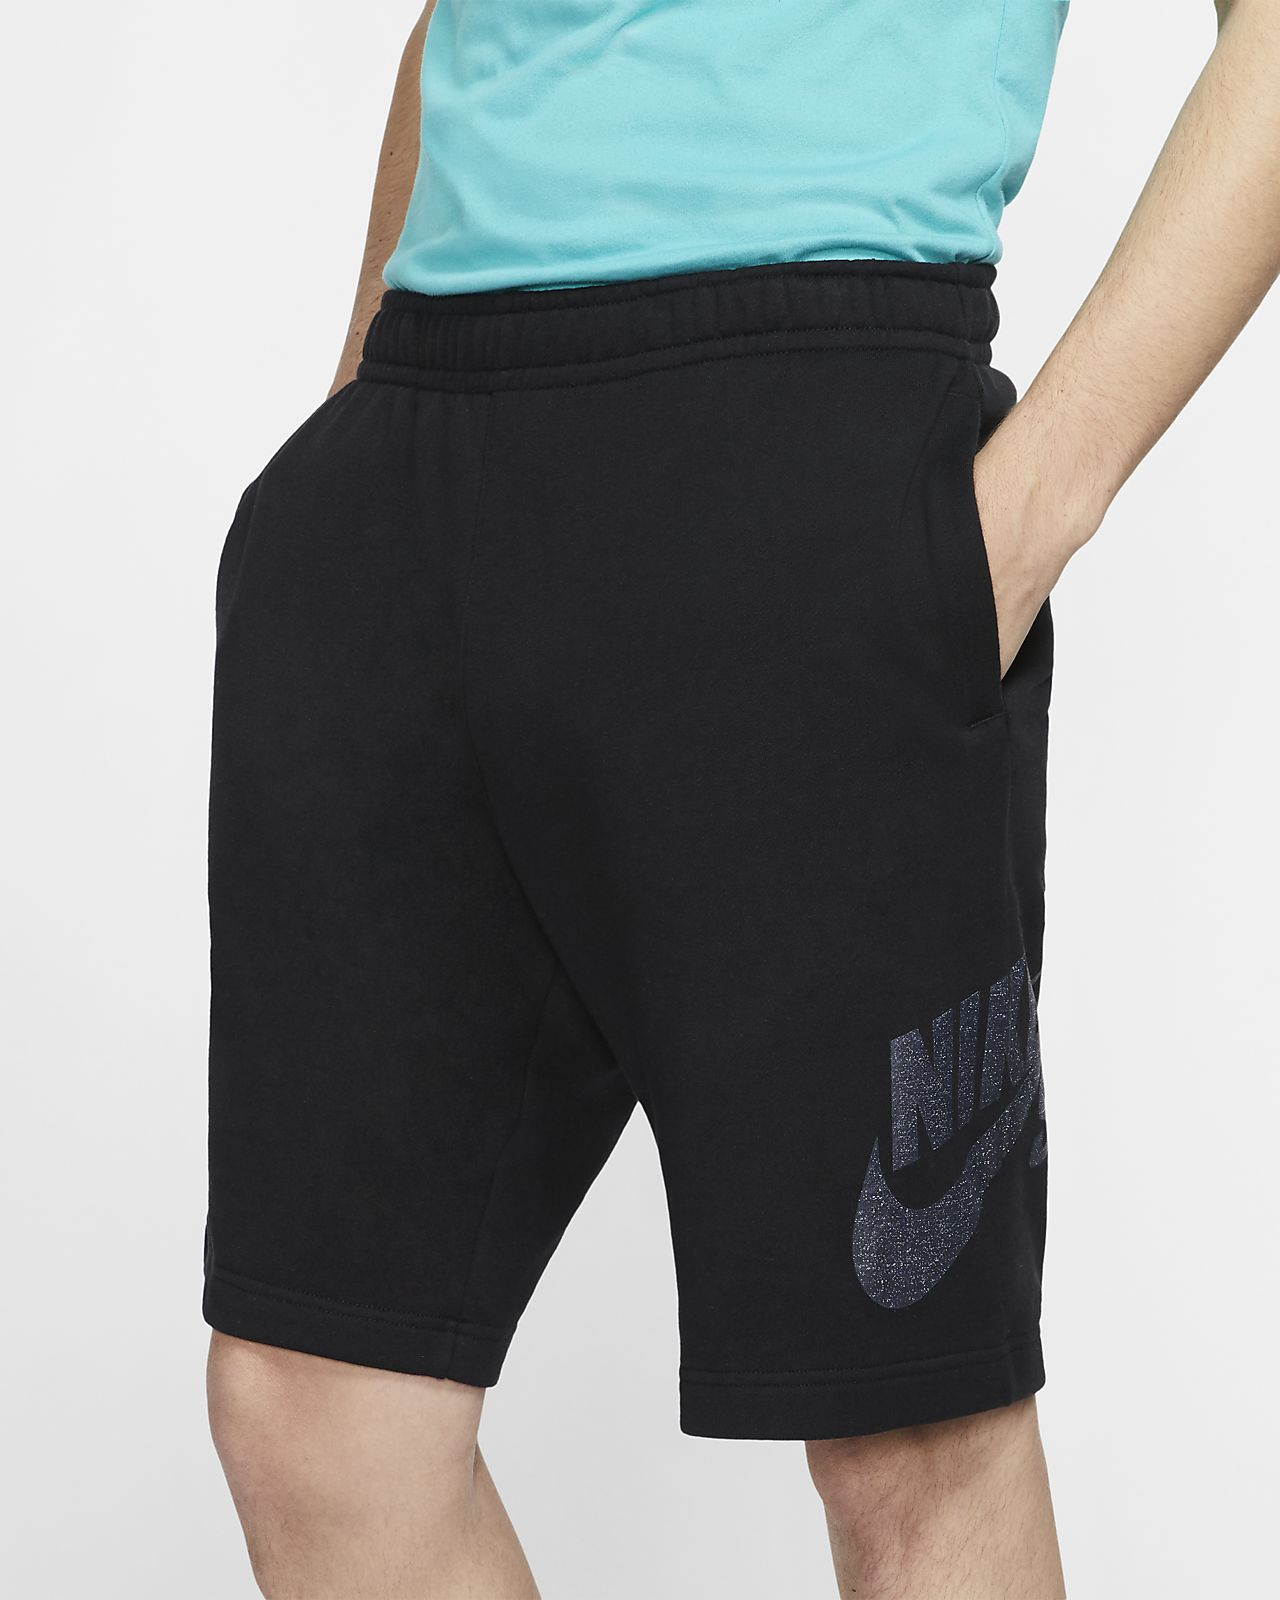 Nike SB Icon Men's Fleece Graphic Skate Shorts